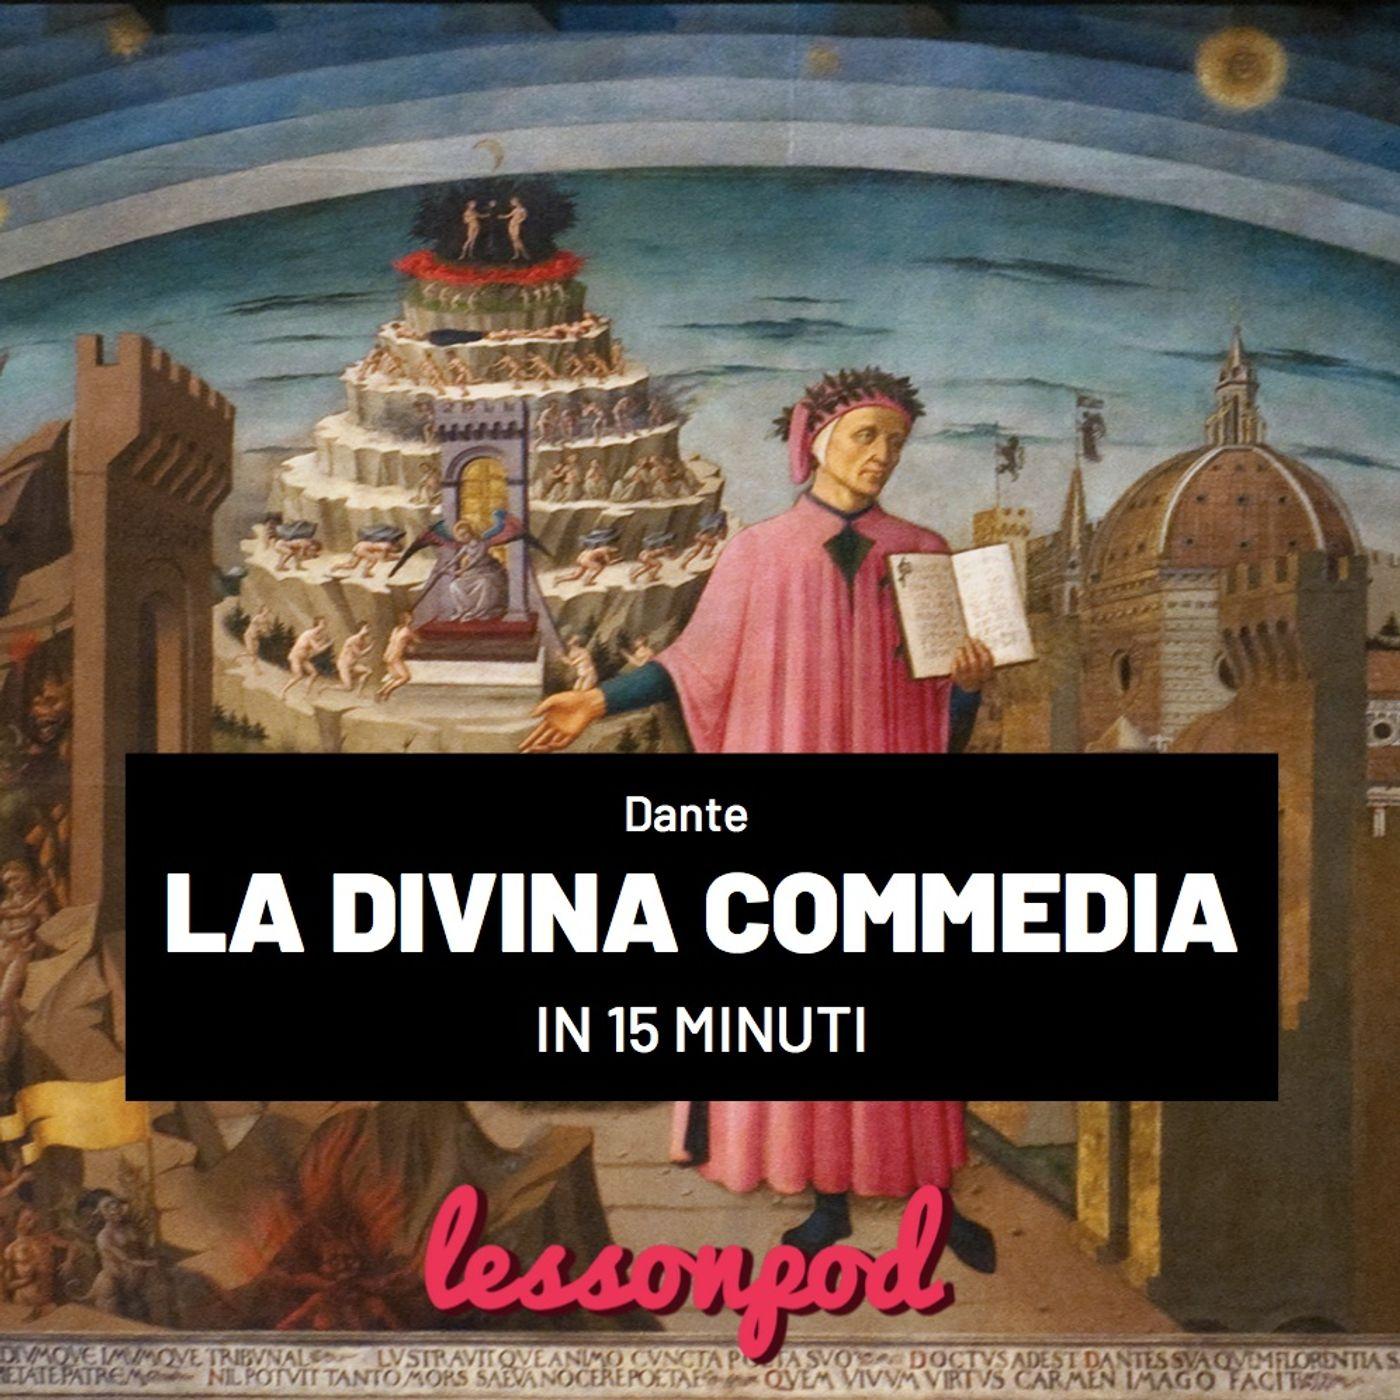 La Divina Commedia di Dante in 15 minuti